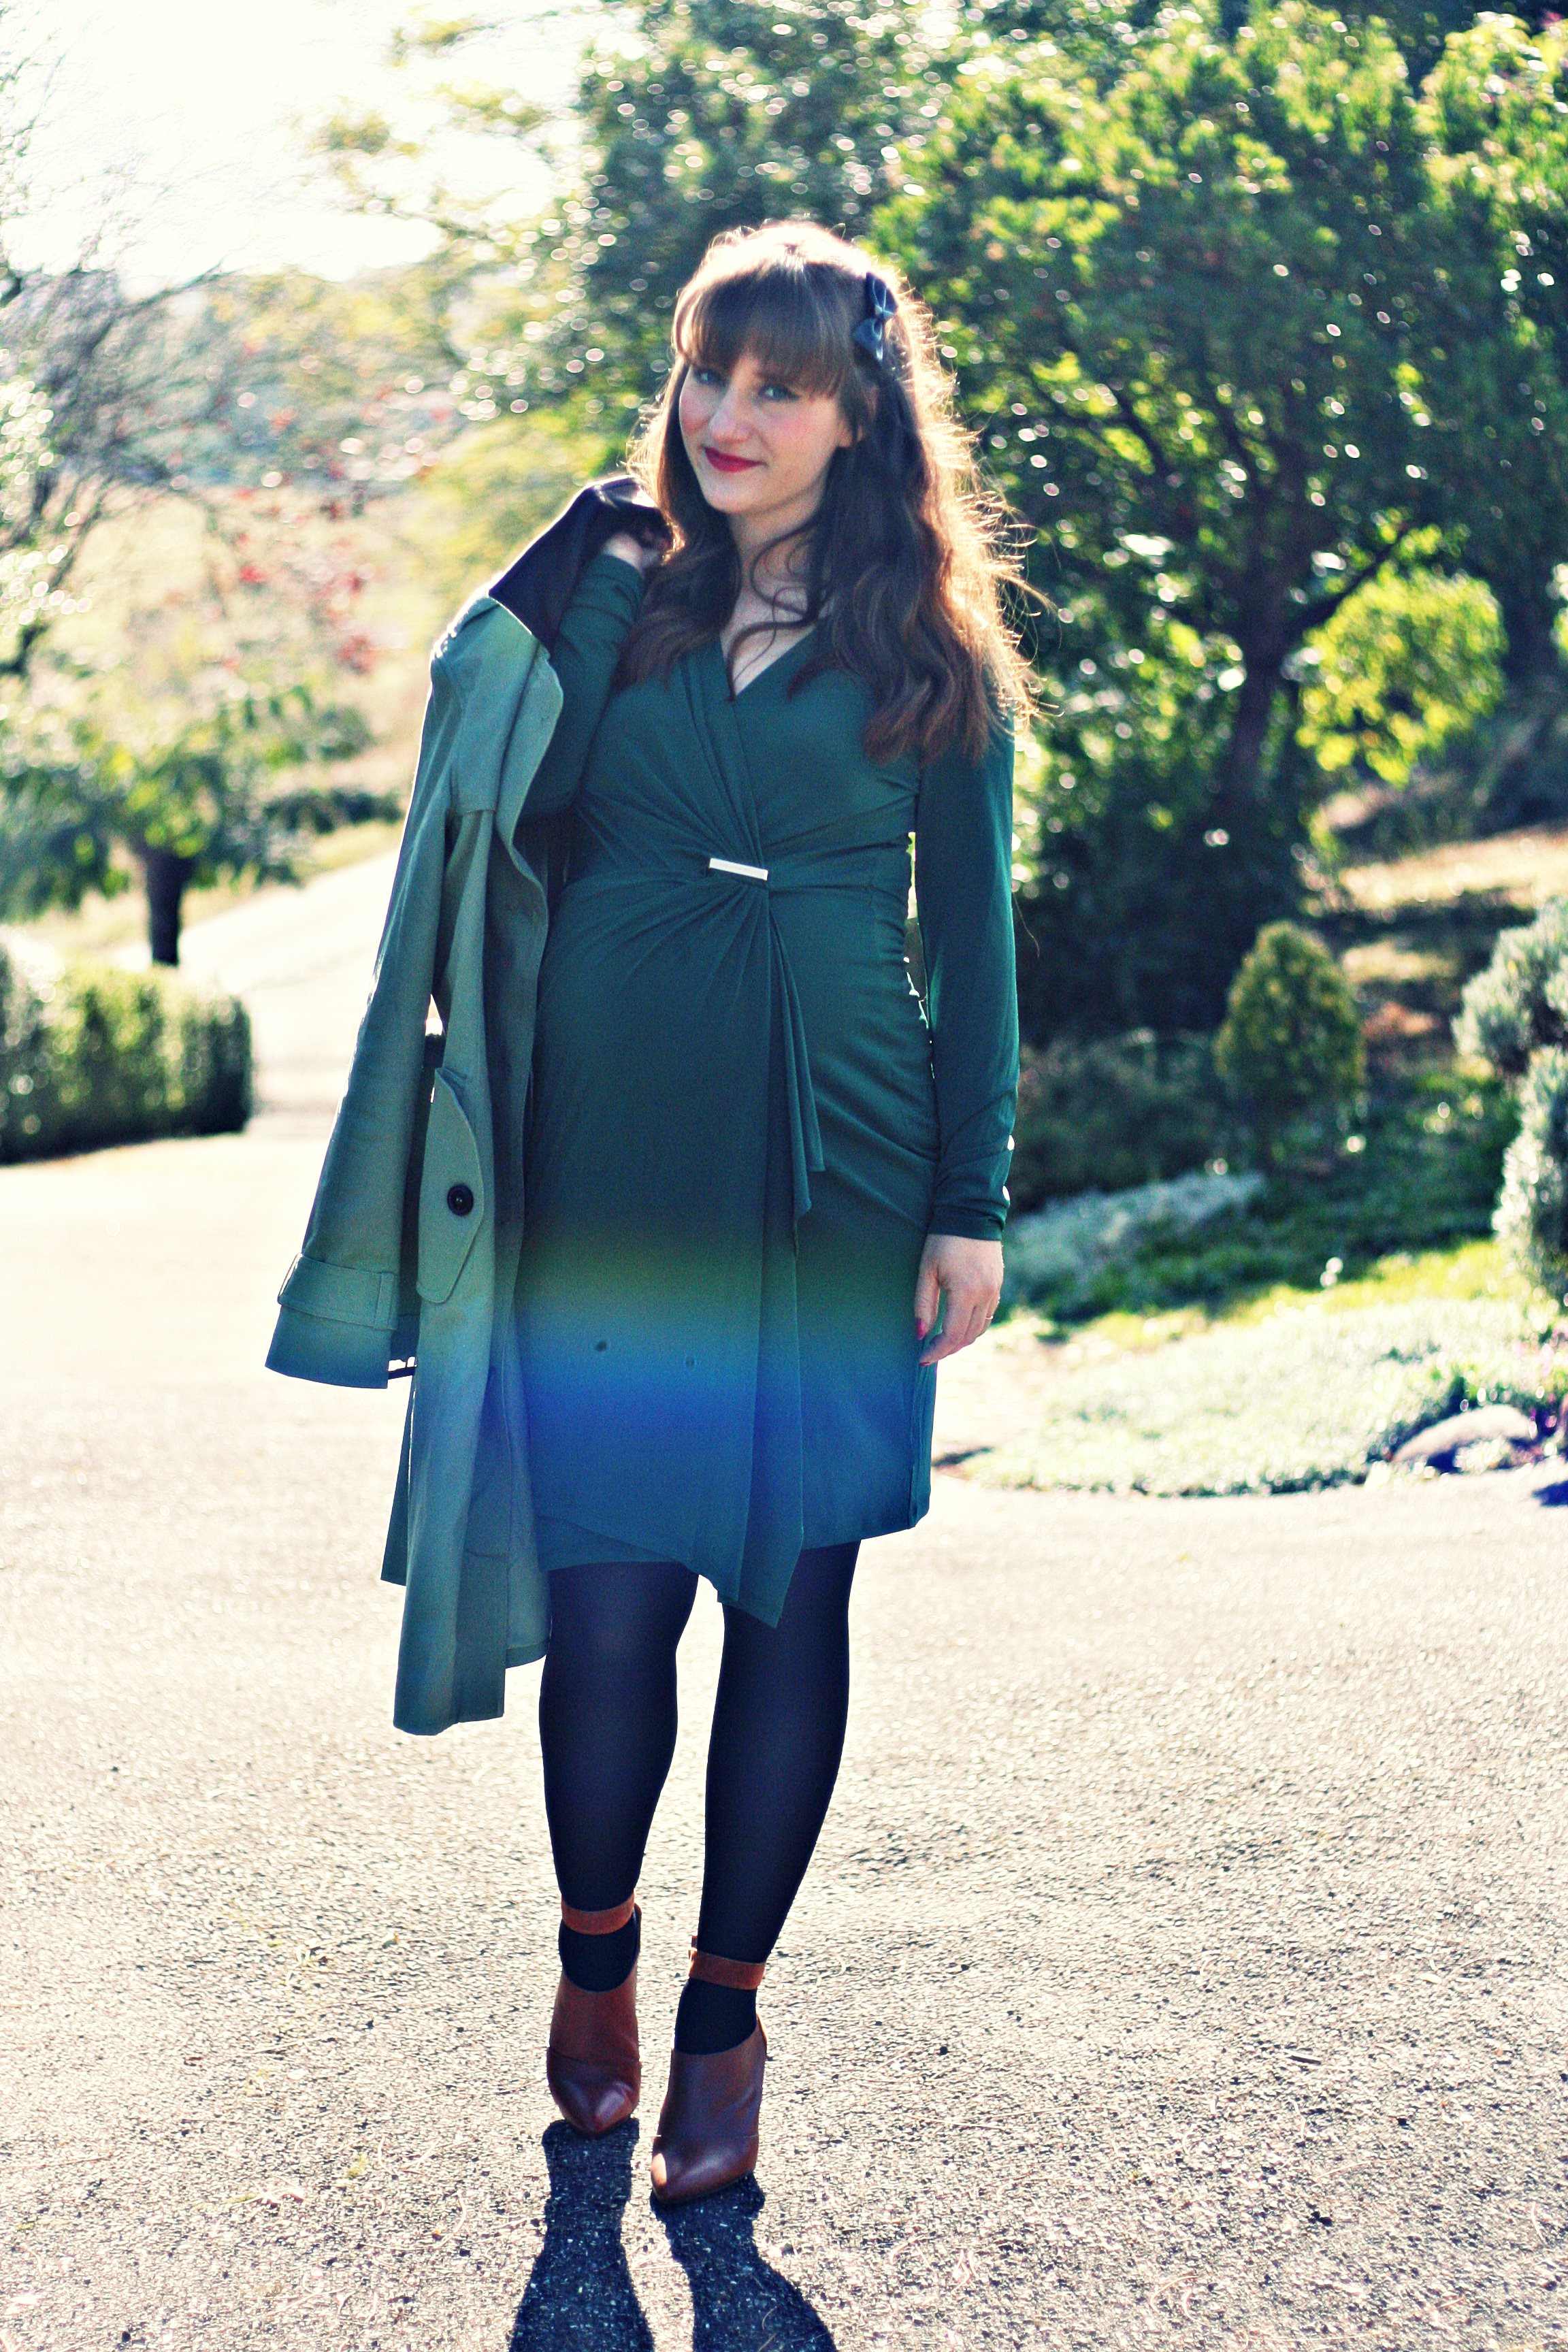 robe-michael-kors-zalando-blog-mode-boots-compensées